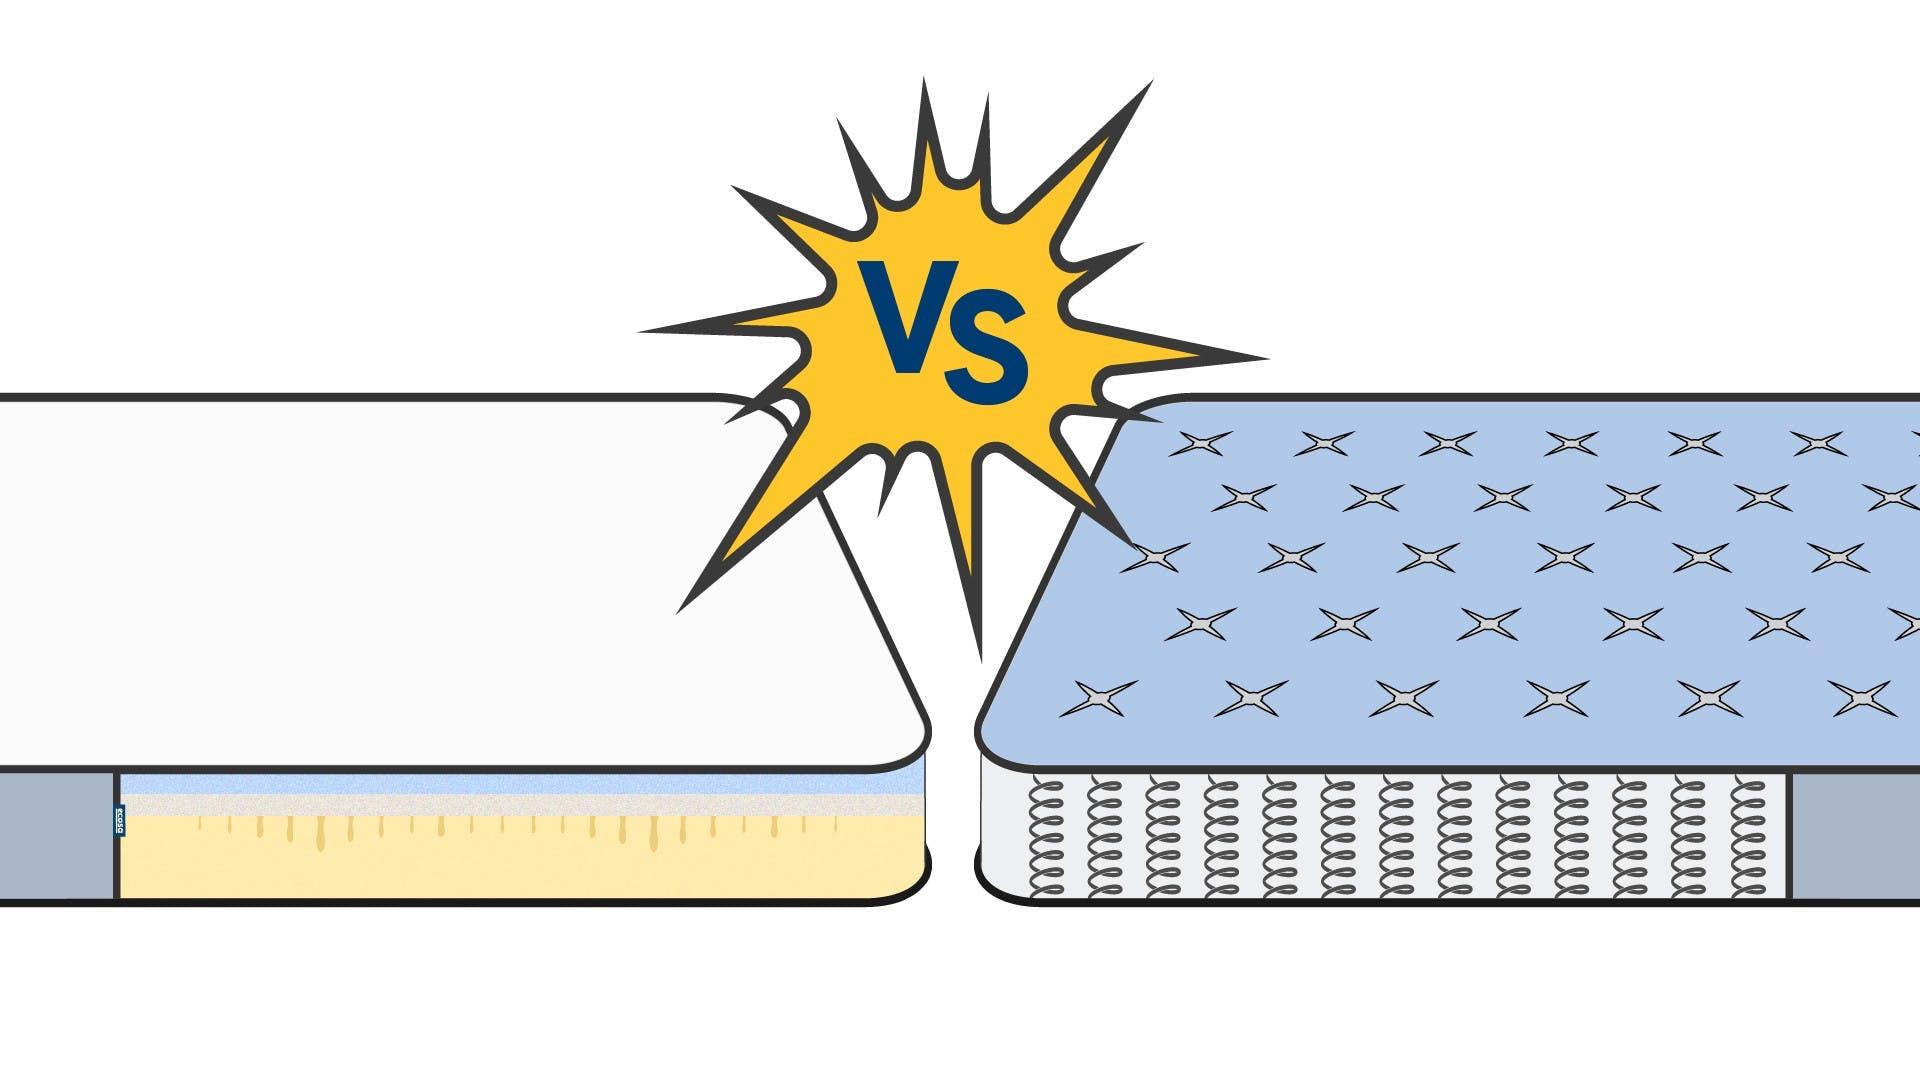 Lifespan of the Ecosa Memory Foam Mattress VS. Other Mattresses